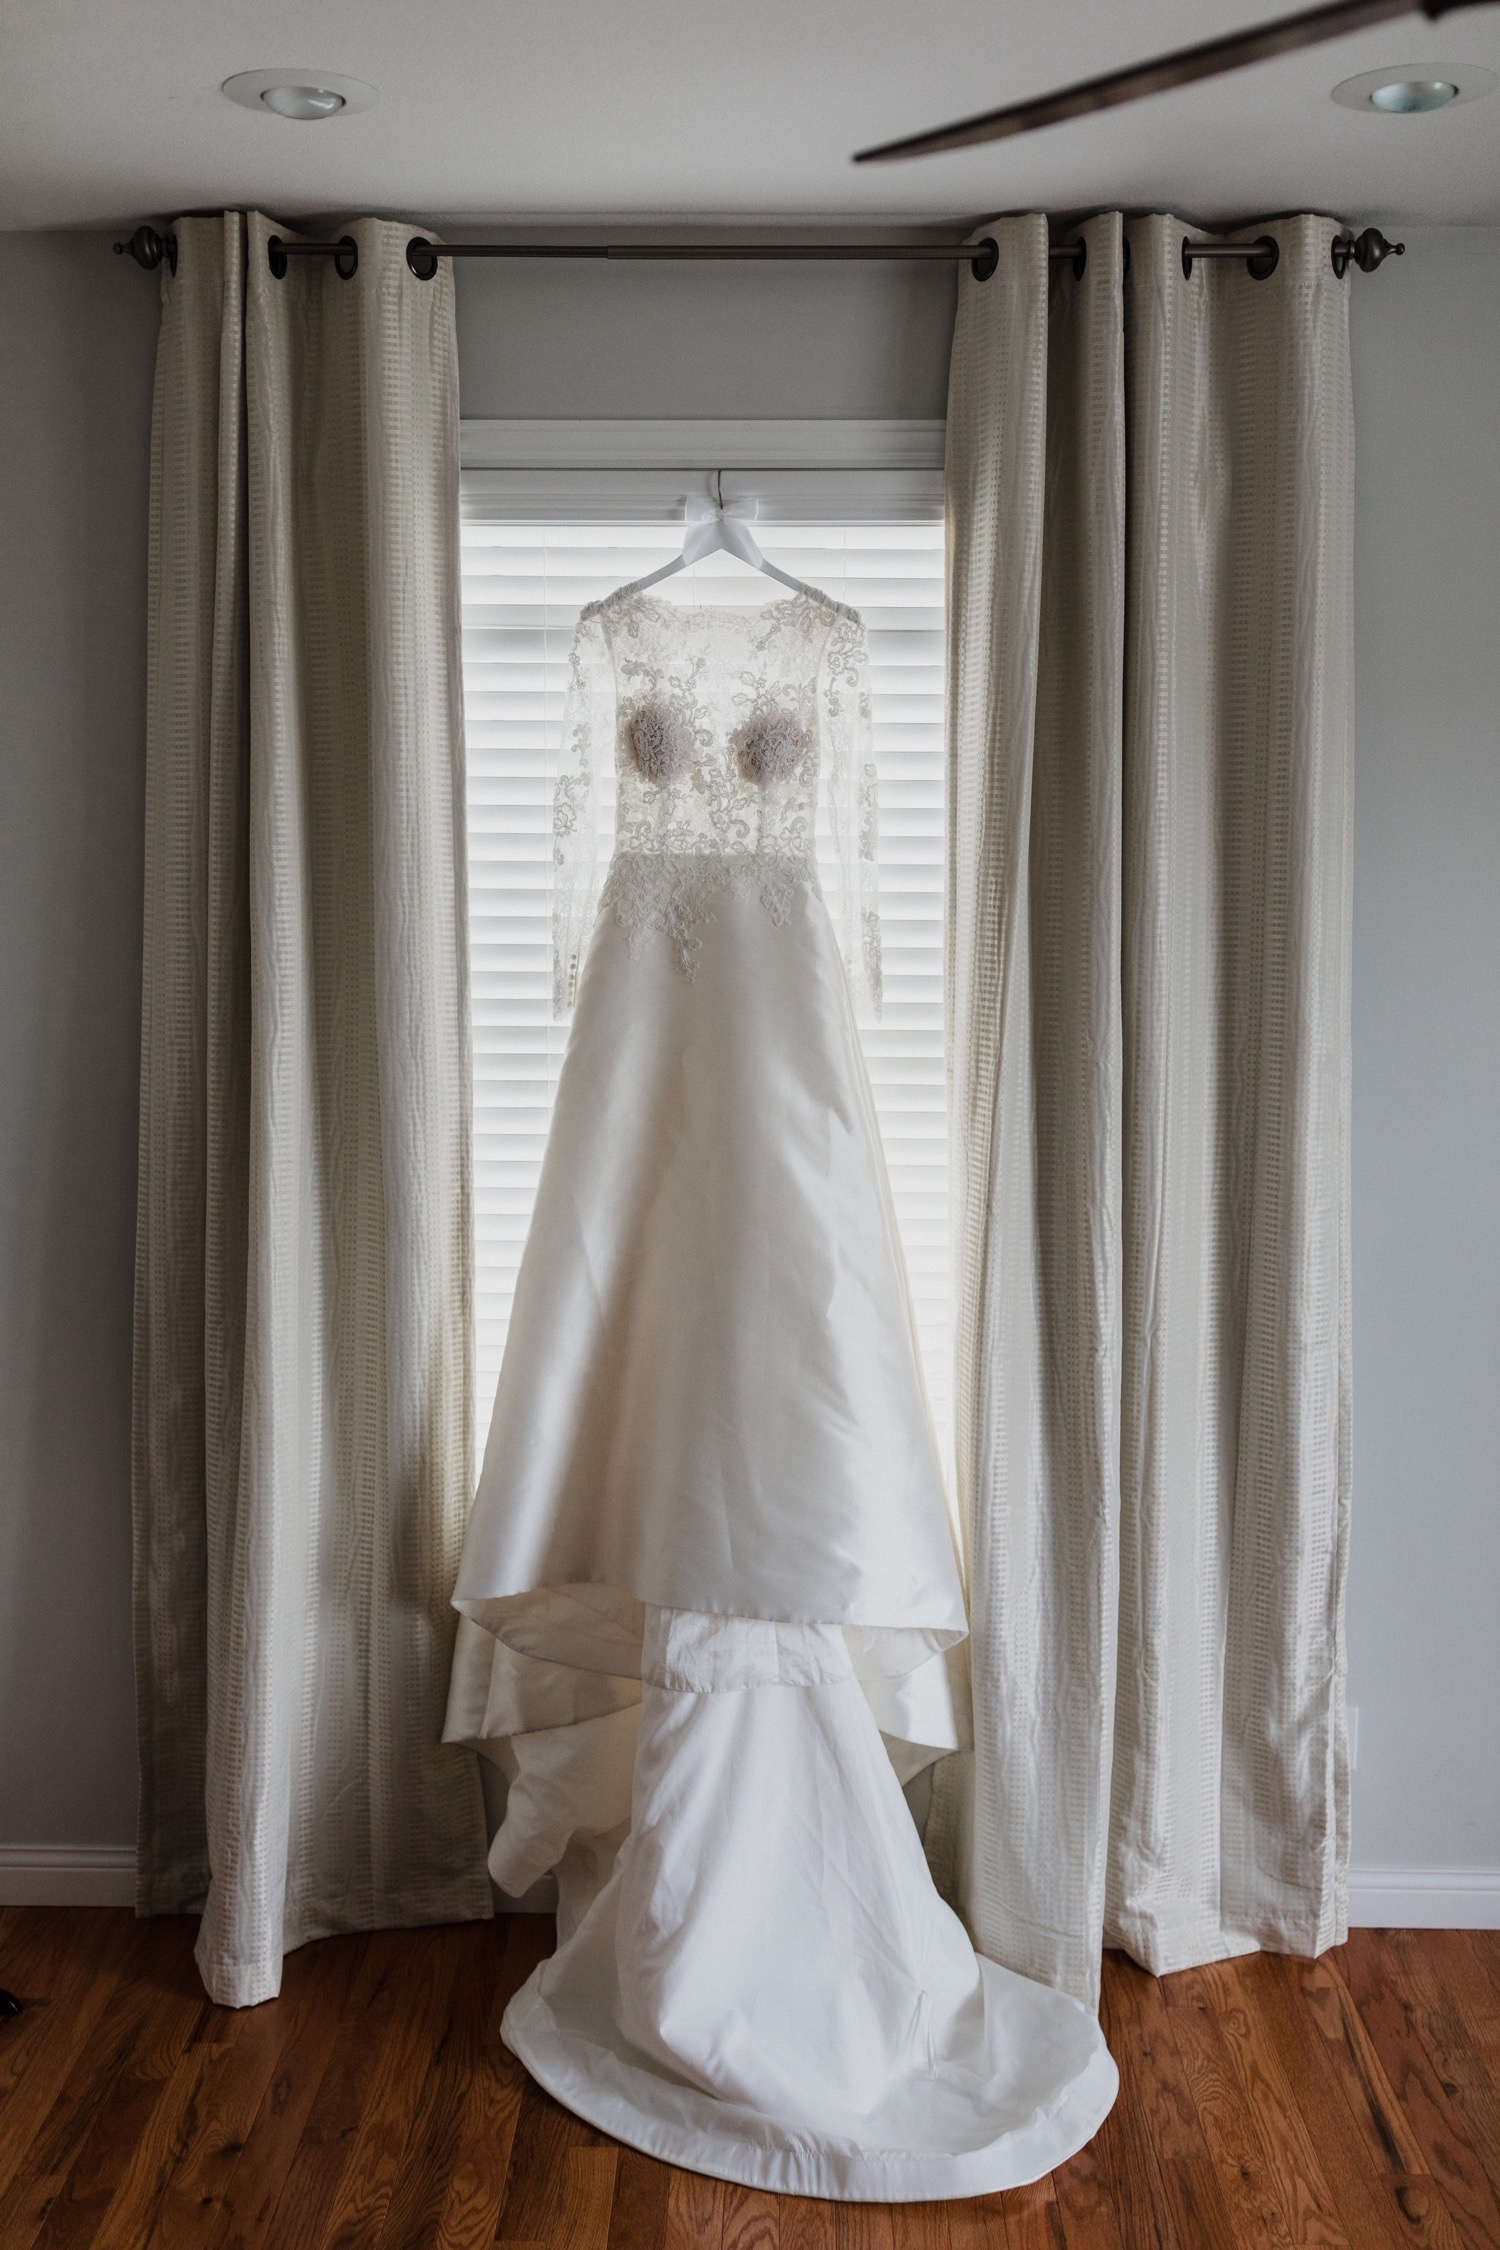 005_Hennings-65_Kansas_Kelsey_Center_Missouri_Wedding_Diane_Jackson's_Photography_Event_Marshall_City.jpg